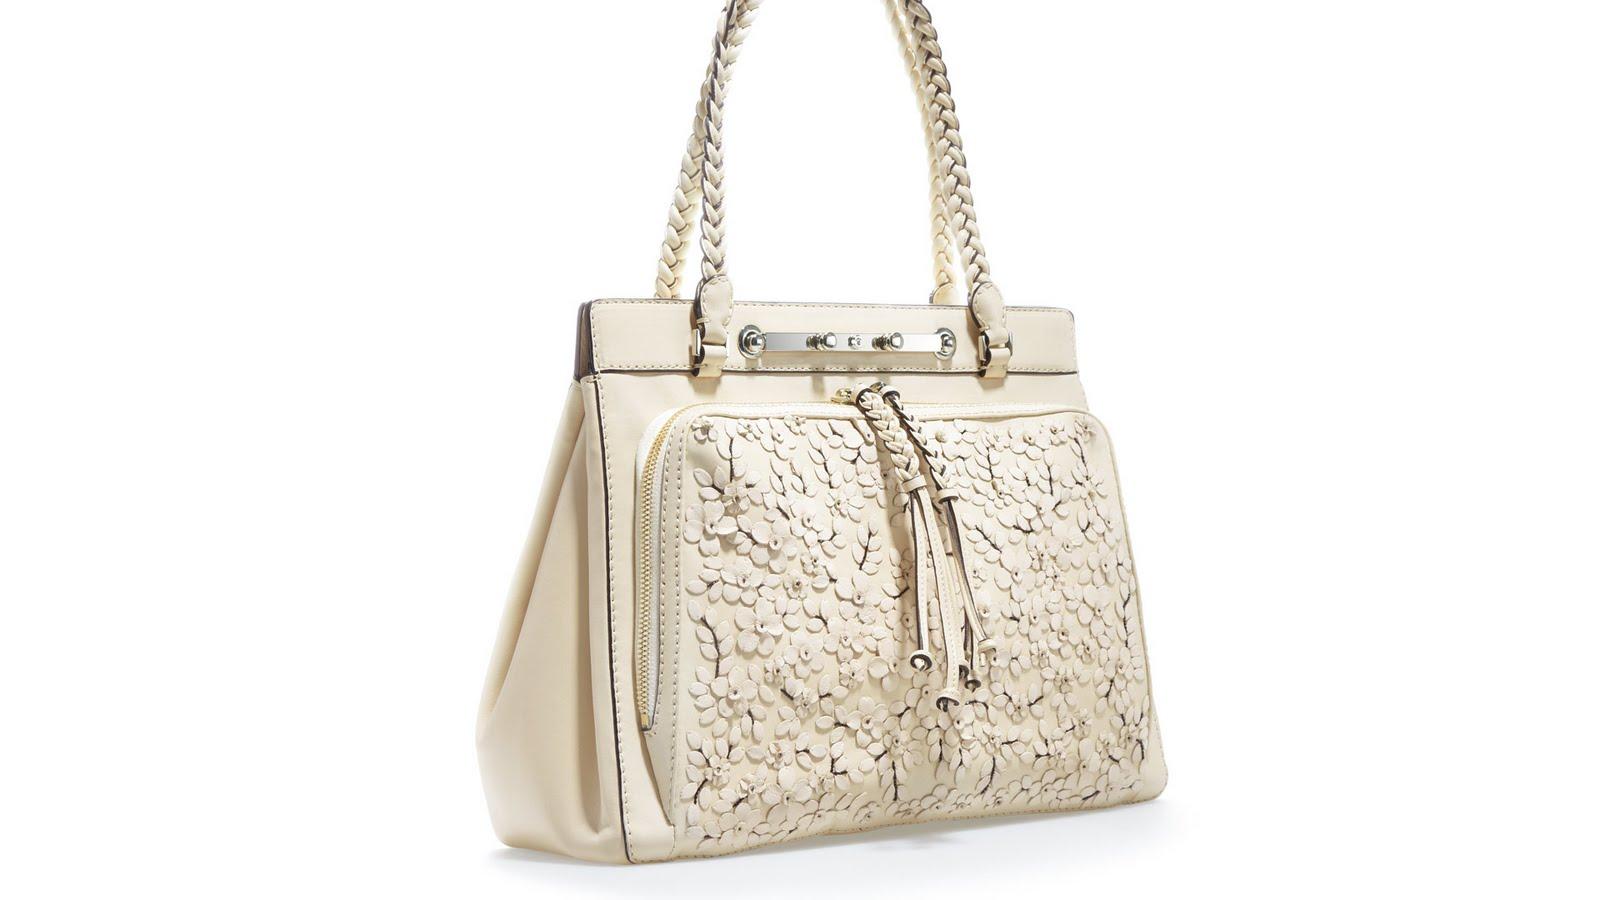 f2ef6544f207 fake chanel 28668 handbags chanel 1113 bags sale for men